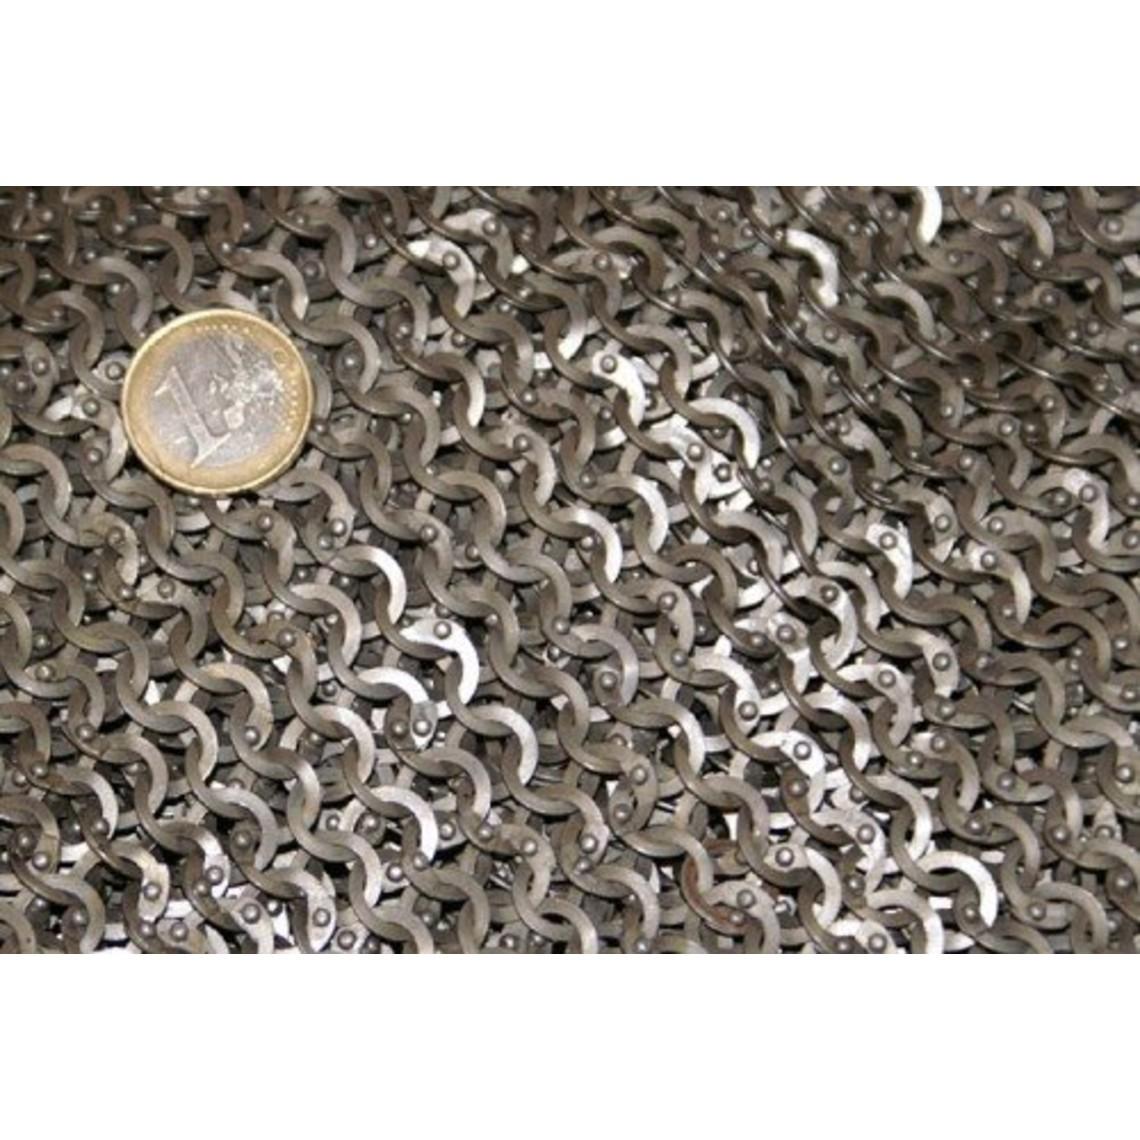 Ulfberth Hauberk with mid-length sleeves, flat rings - round rivets, 8 mm